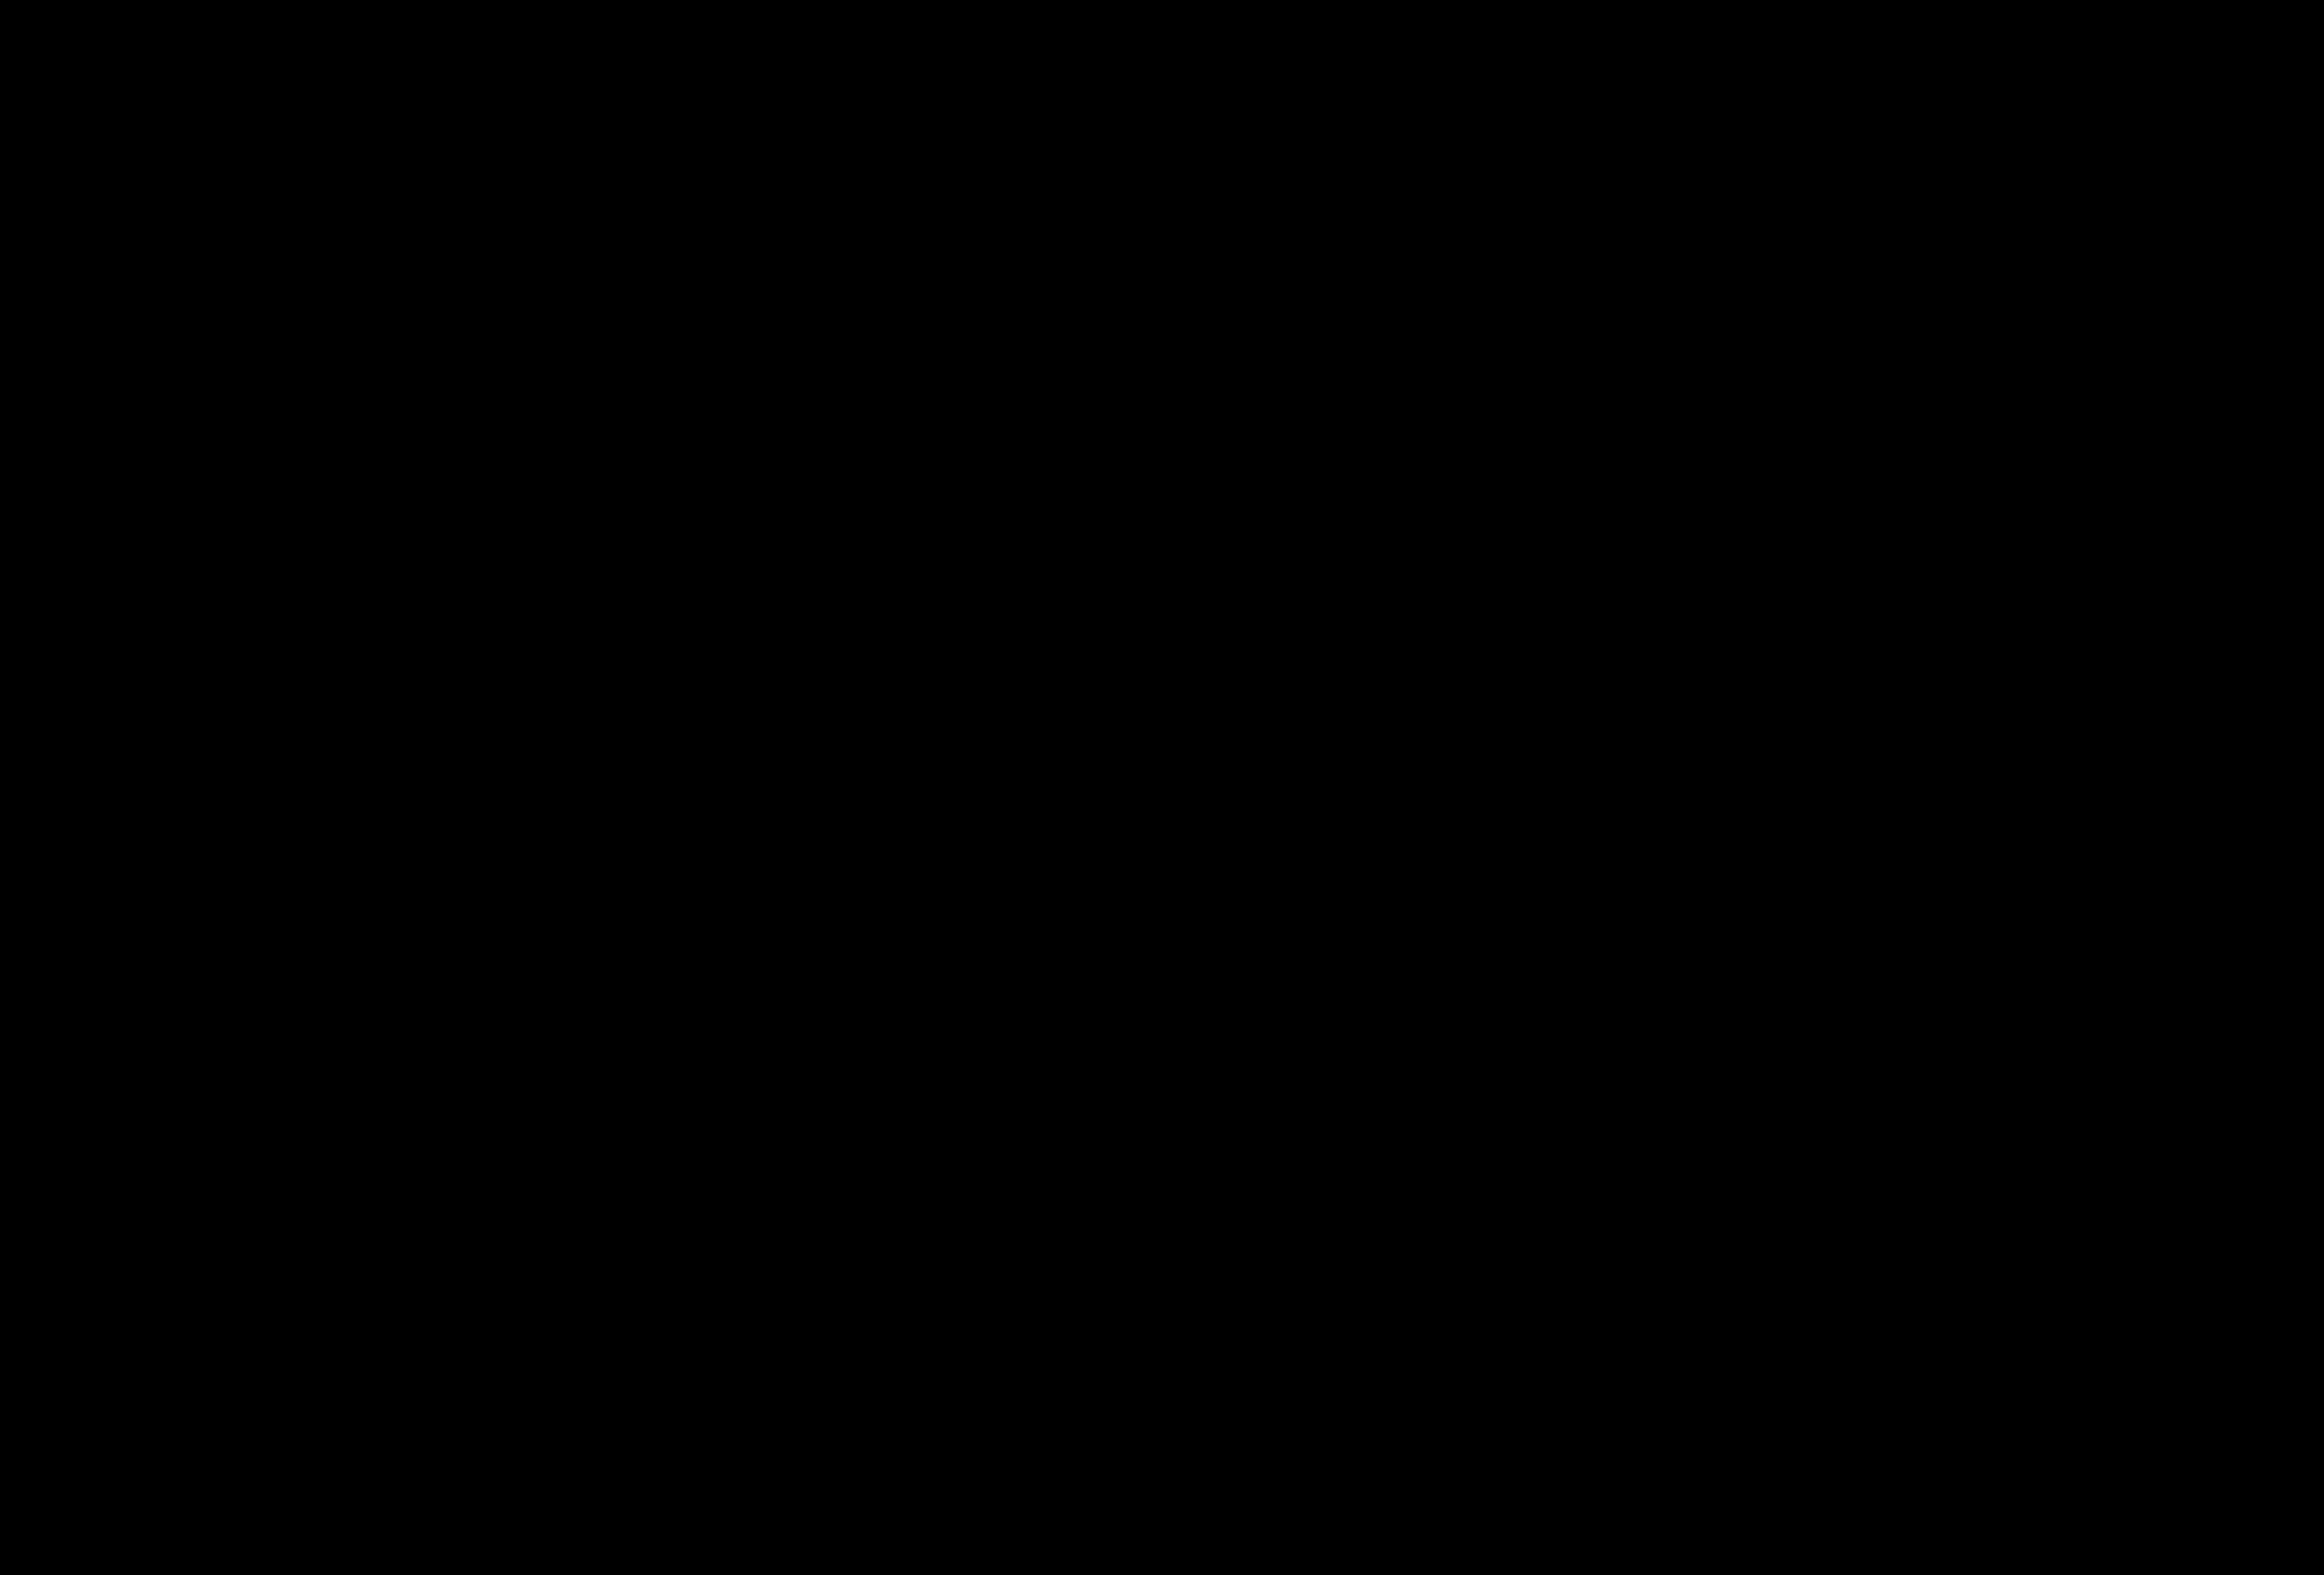 20180802_210808 (3)